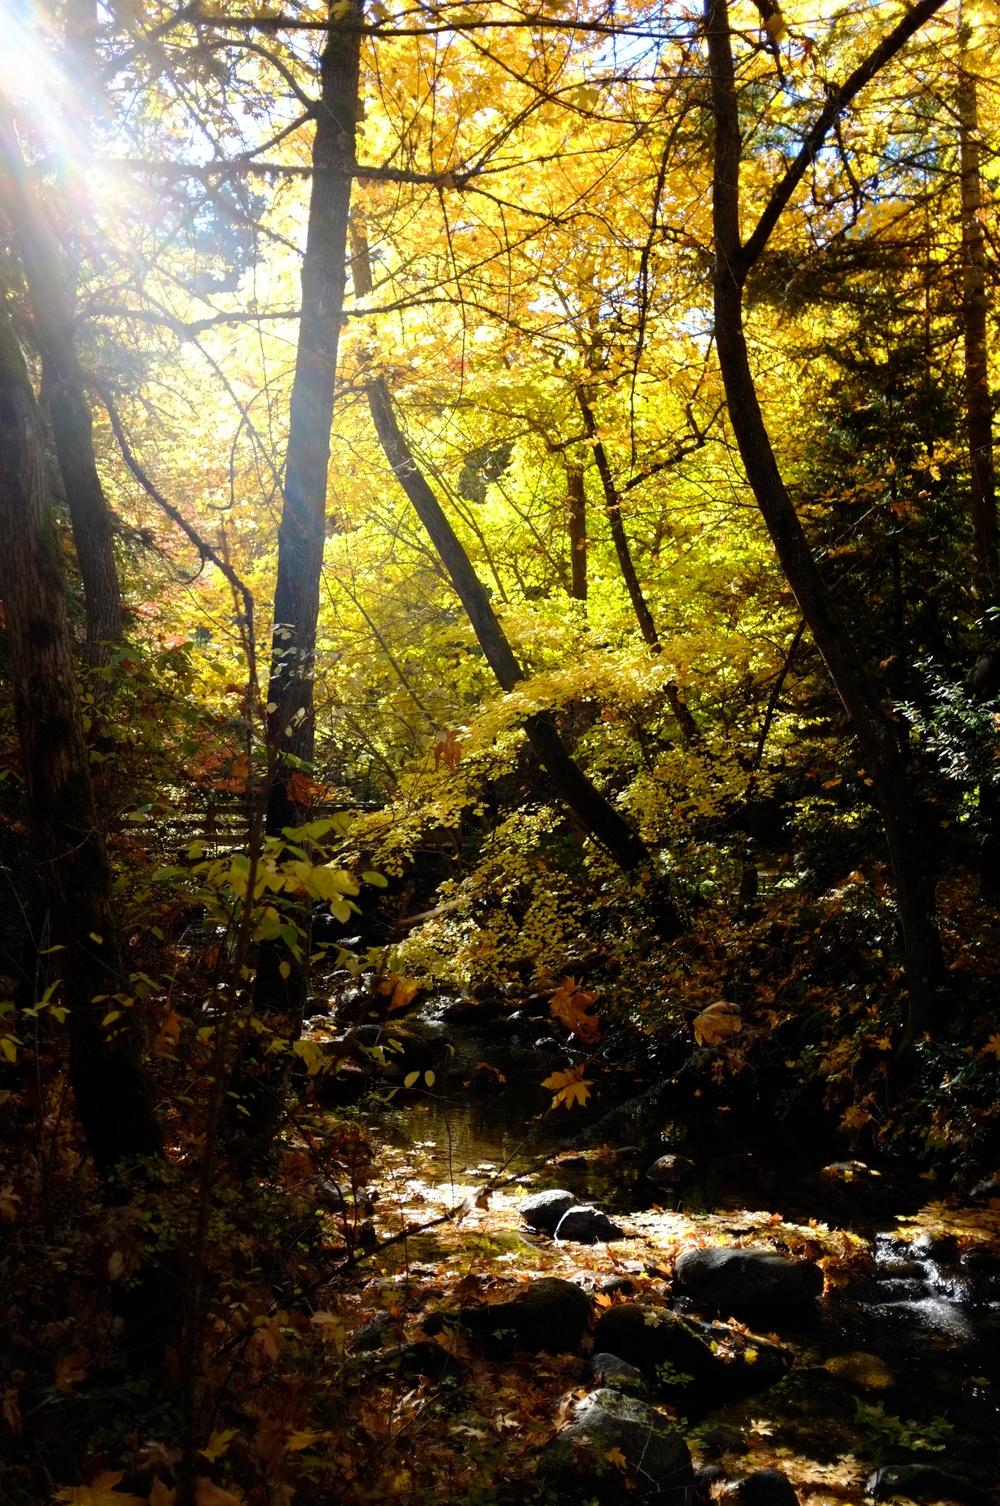 Rebecca_2012-11-04_11-59-06__DSF1575_©JosephLinaschke2012.jpg